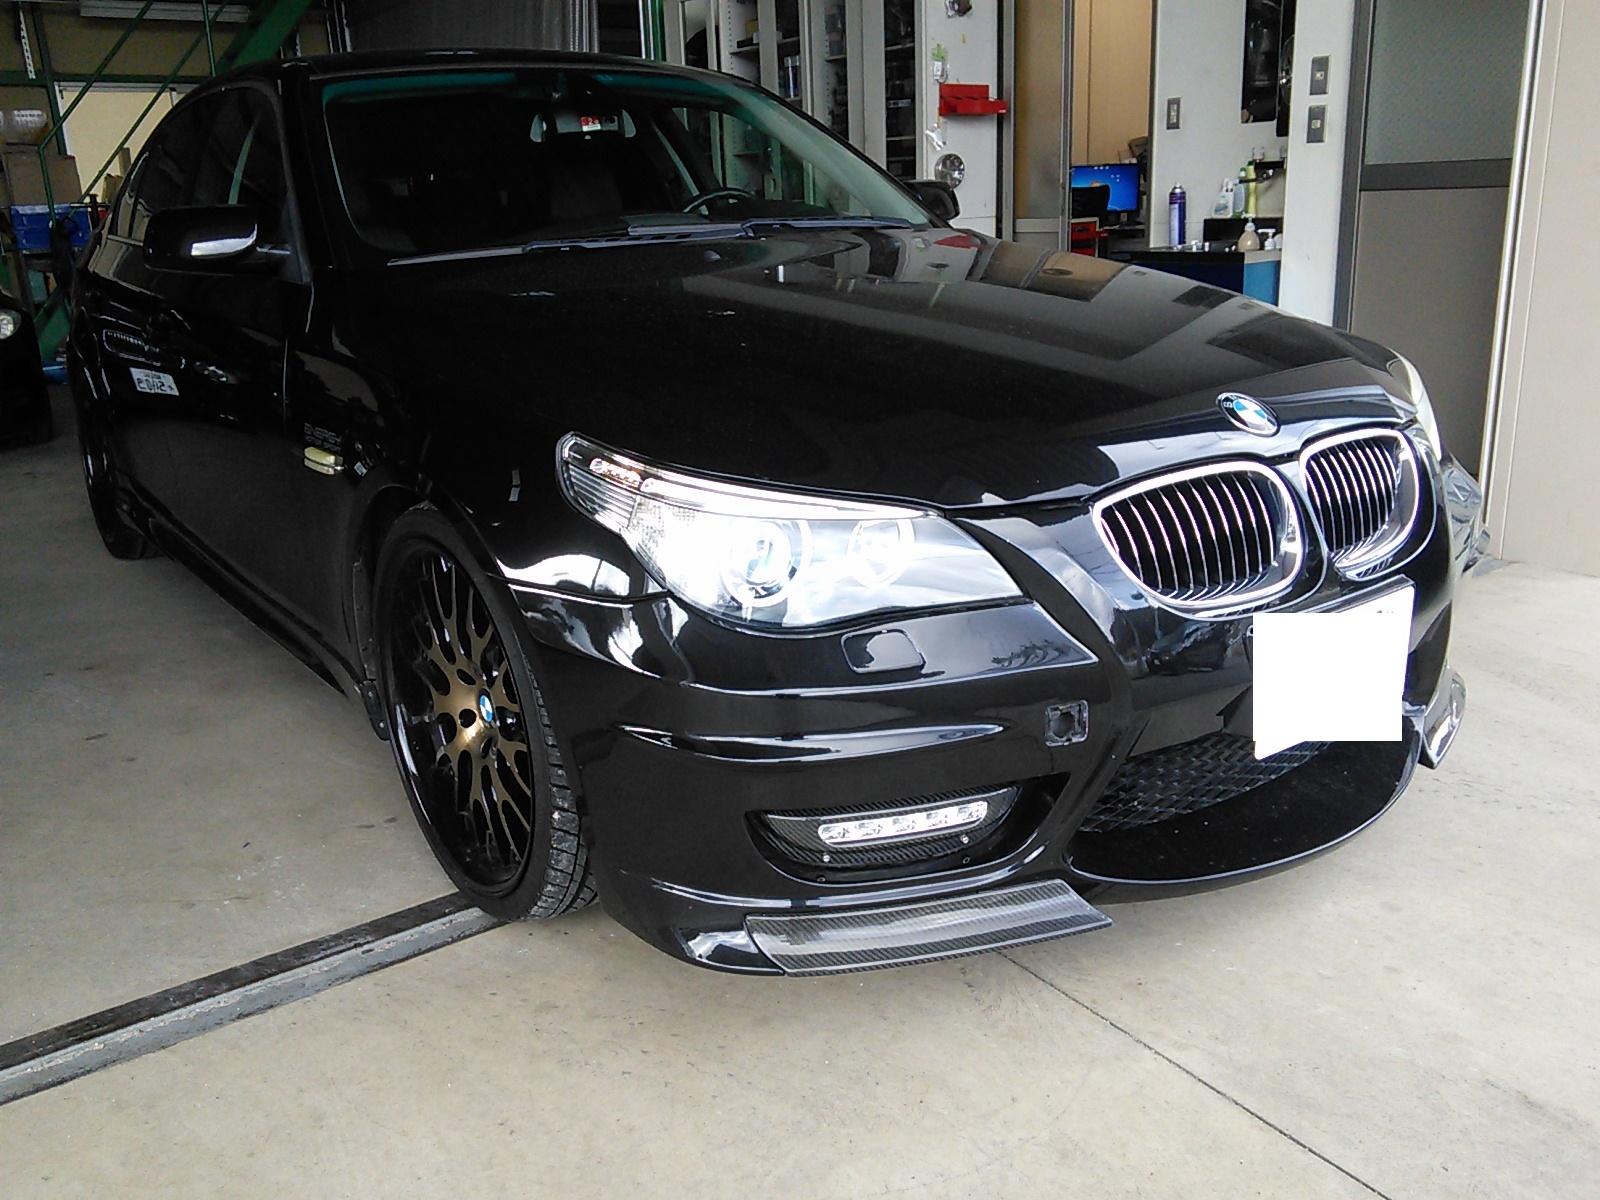 BMW idrive ブラックアウト ナビブラックアウト CCCユニット交換